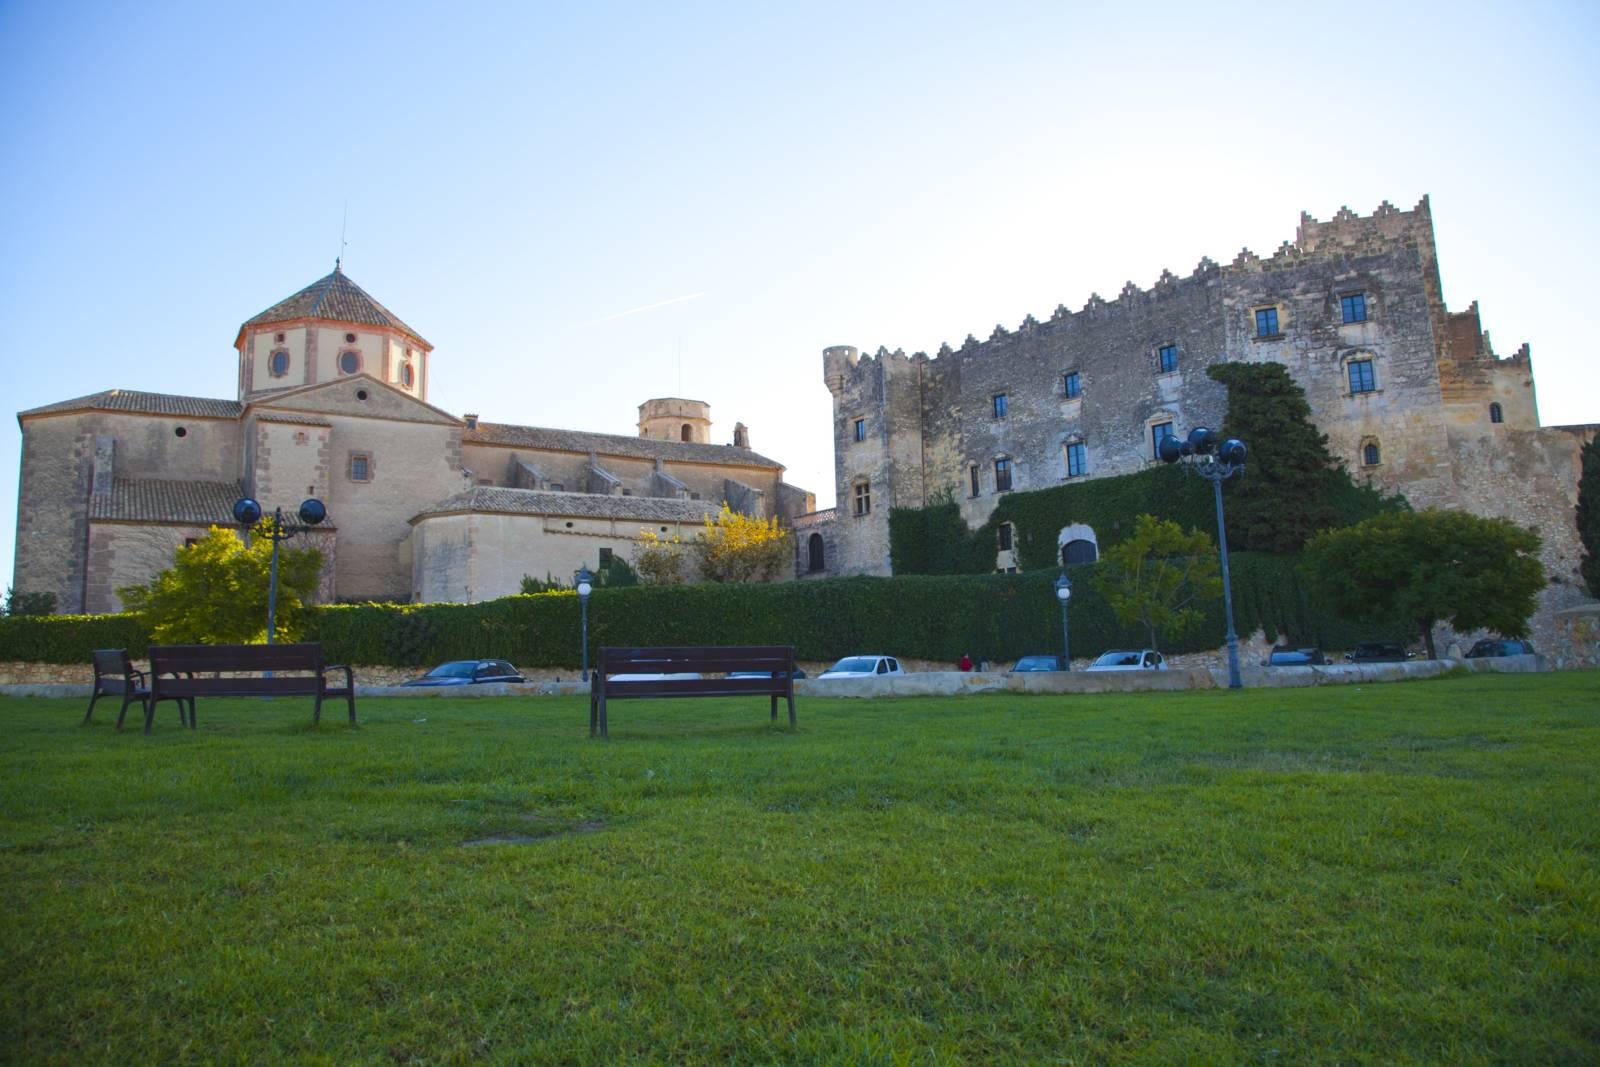 Burg von Altafulla